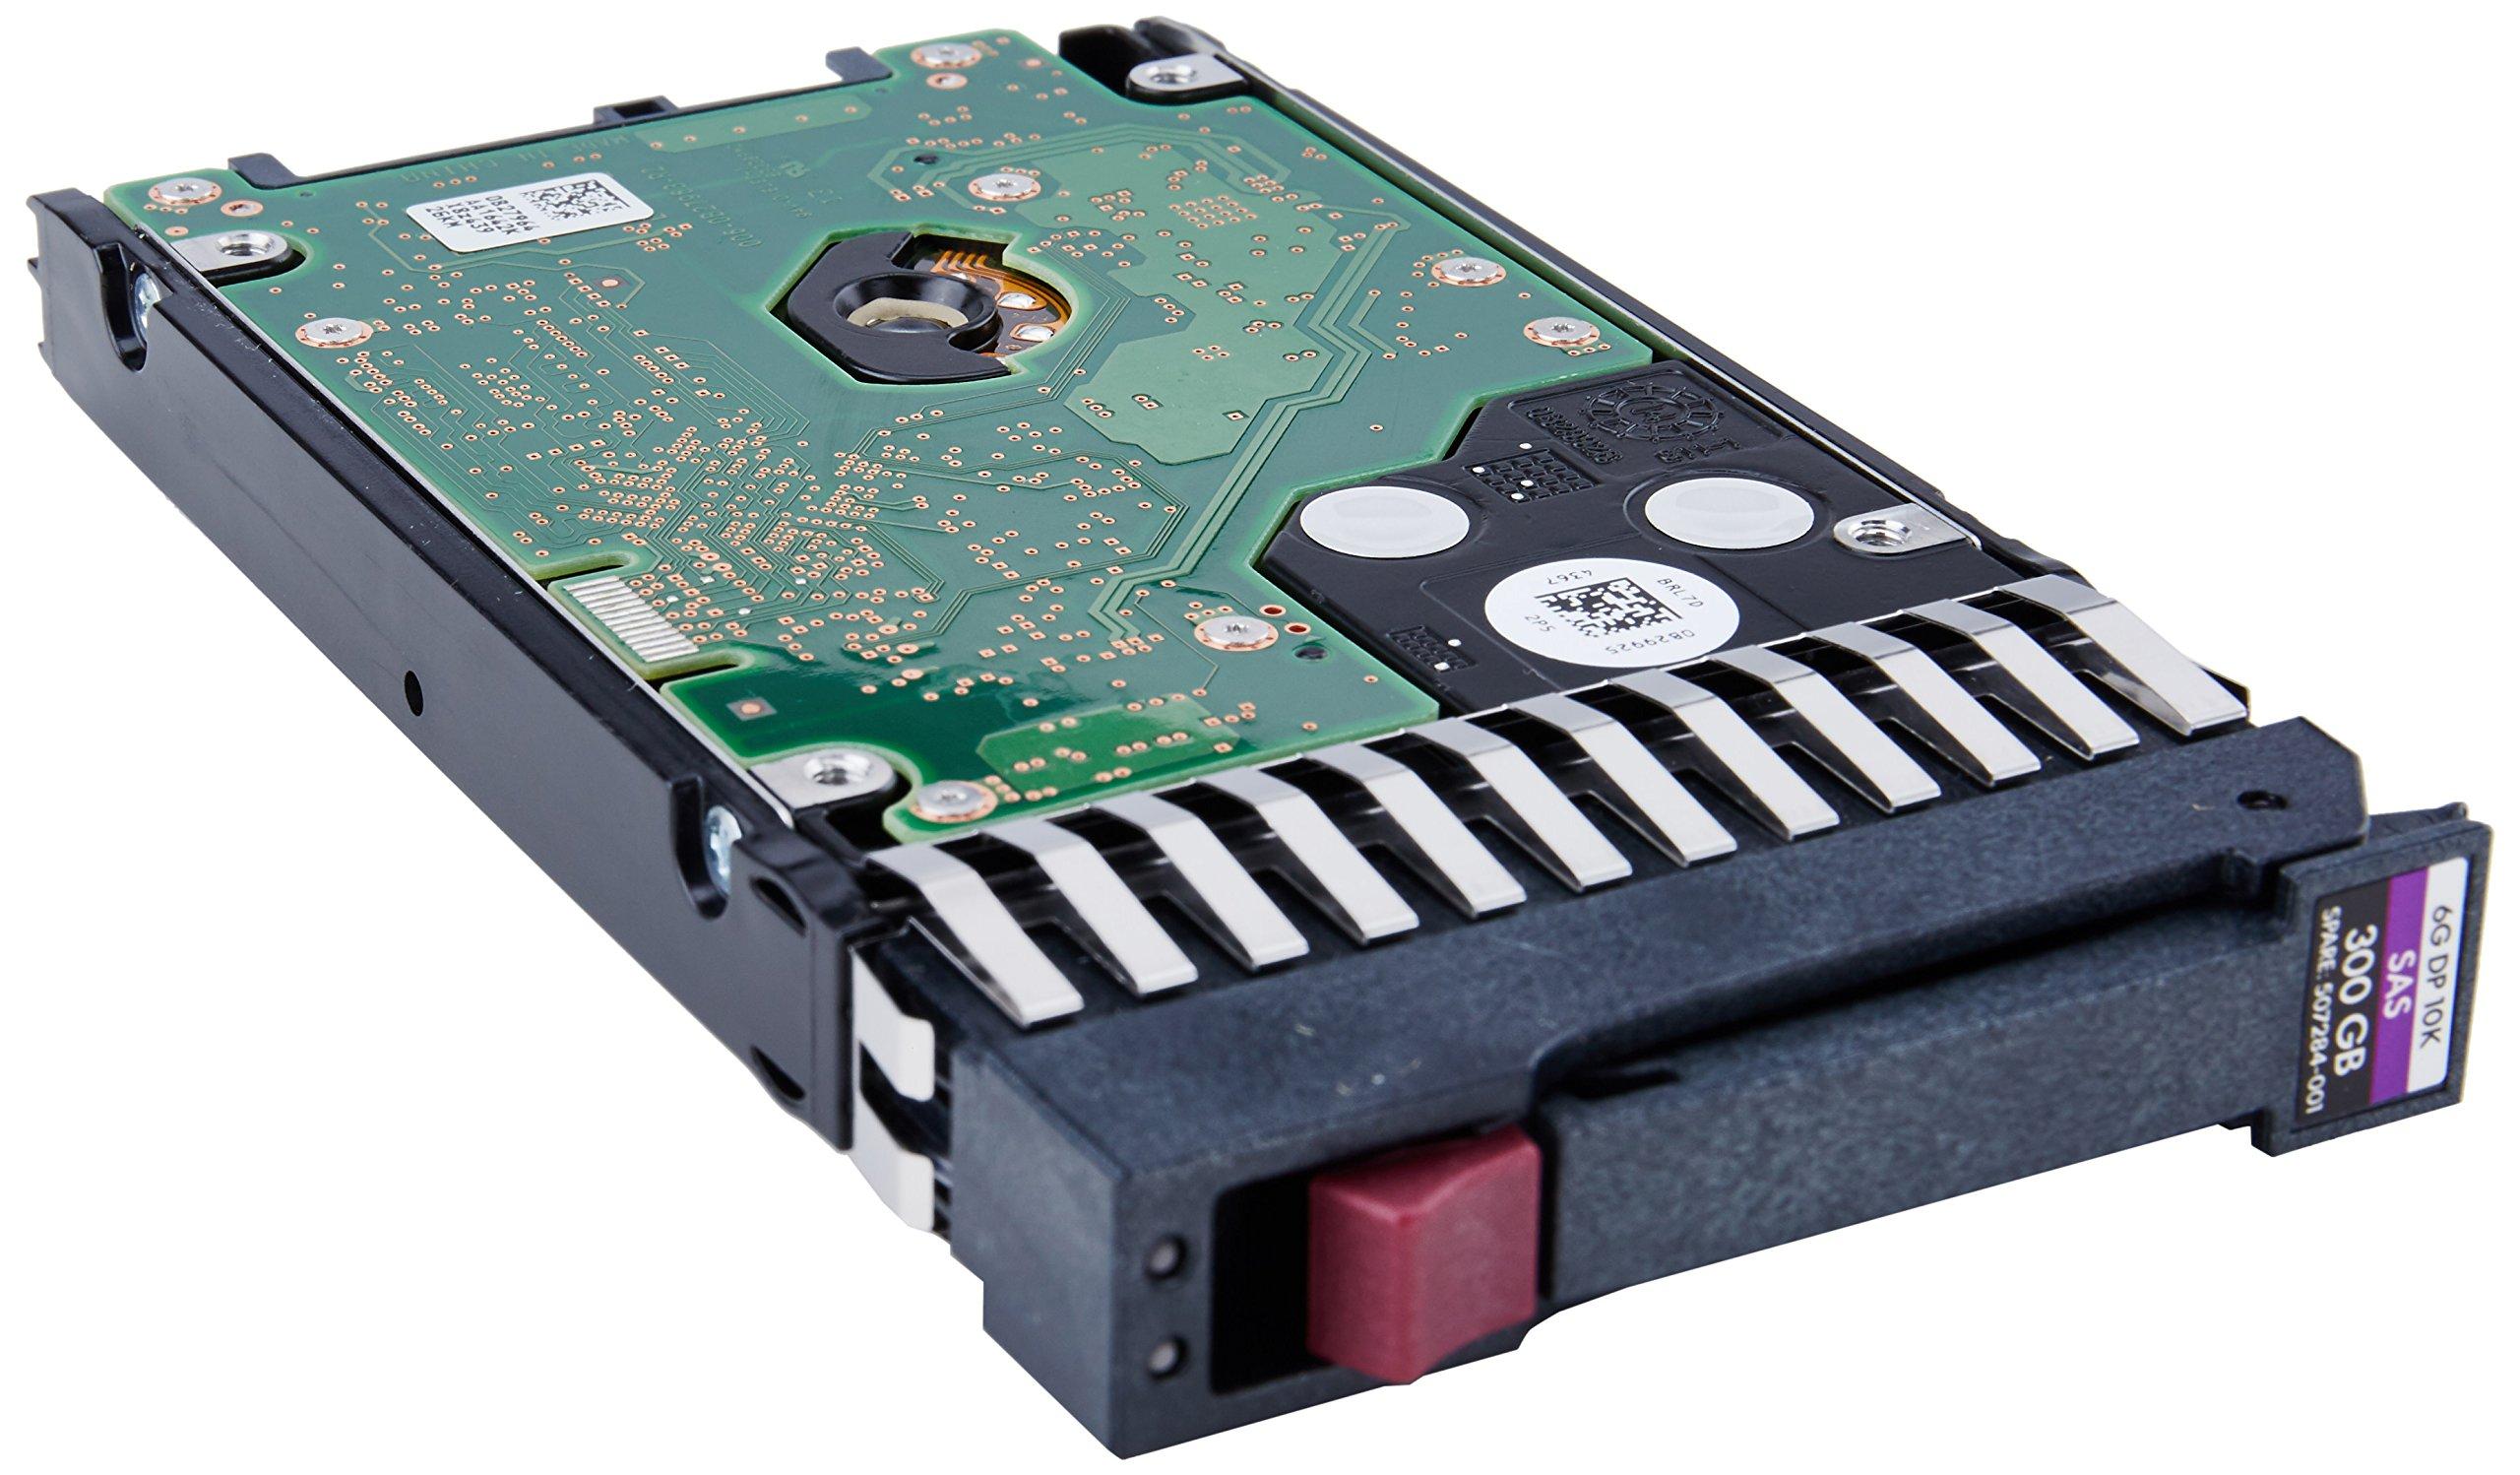 HP 300GB 6G SAS 10K SFF (2.5-inch) Dual Port Enterprise Hard Drive 507127-B21 by HP (Image #3)